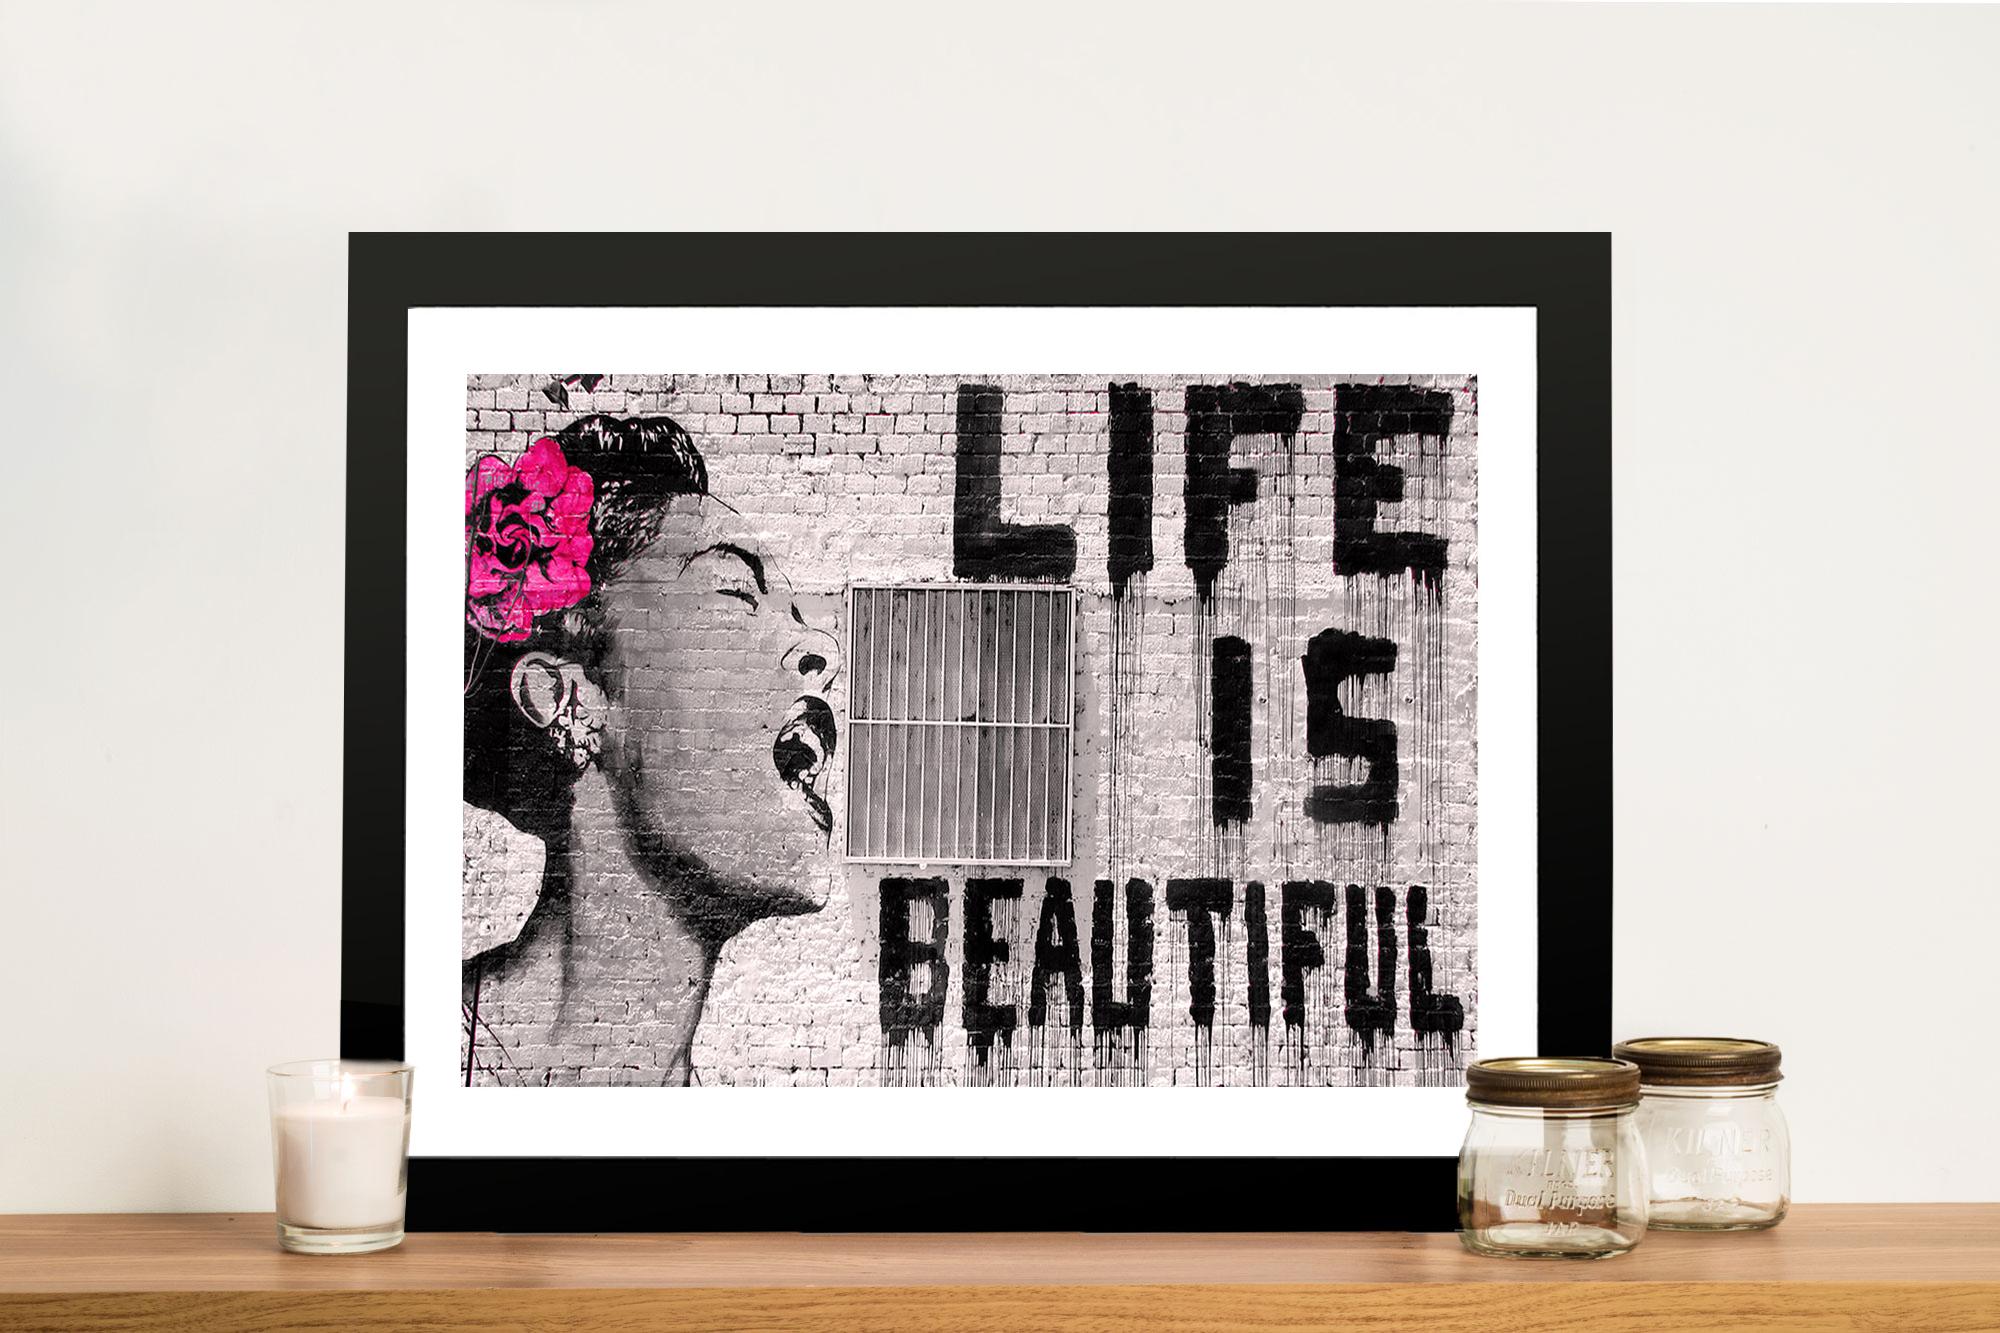 Life Is Beautiful Banksy Work Art Print On Canvas Australian Gallery